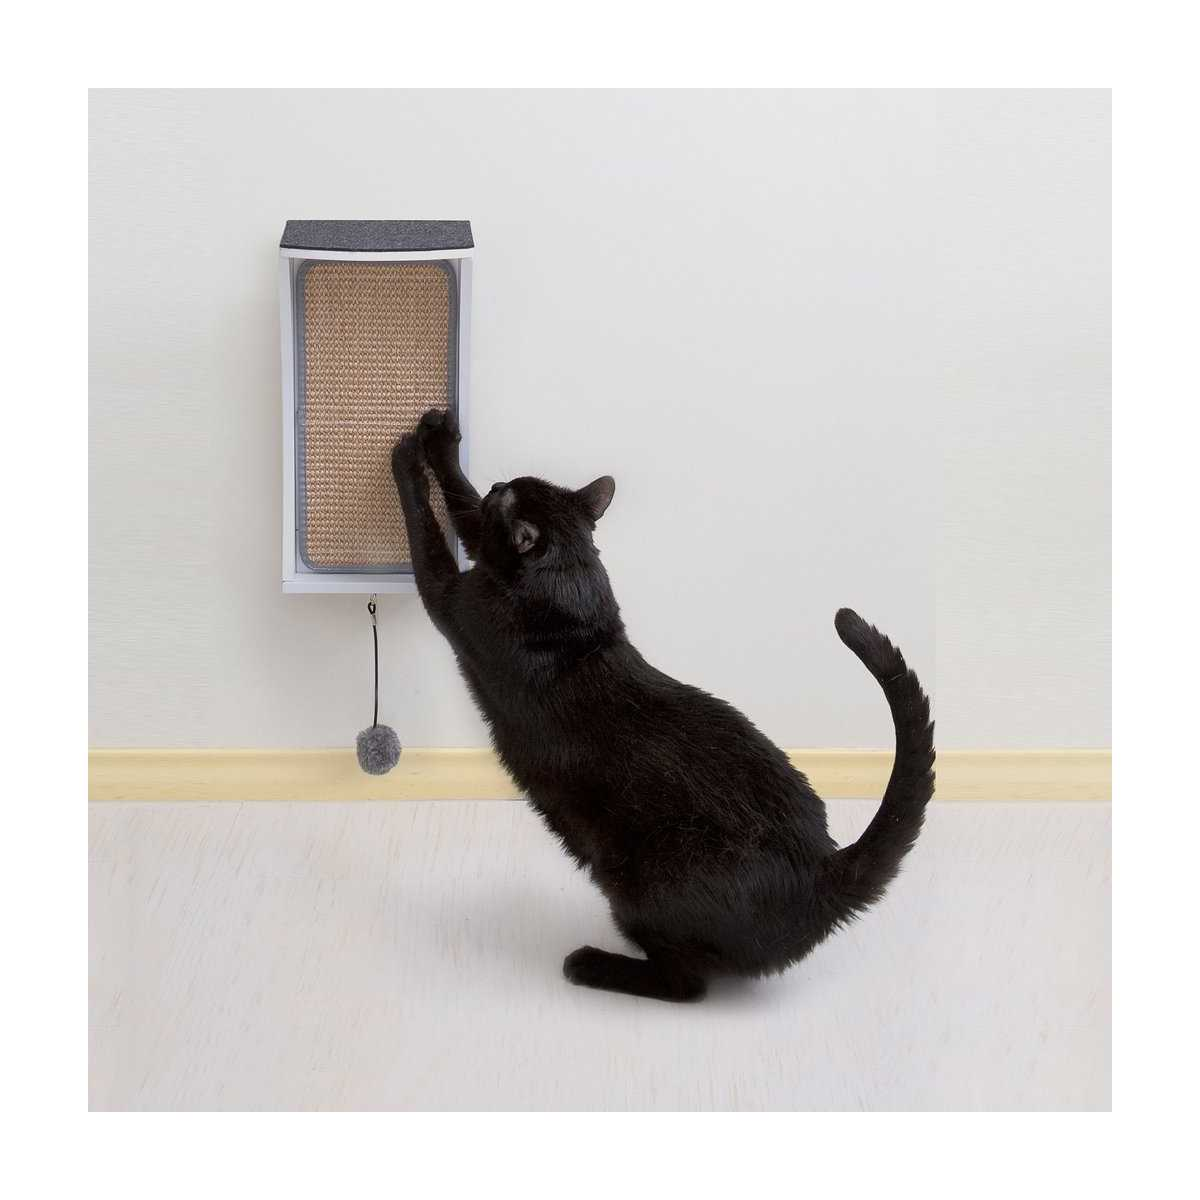 Catchall wall mounted cat scratcher perch storage - Wall mounted cat scratcher ...